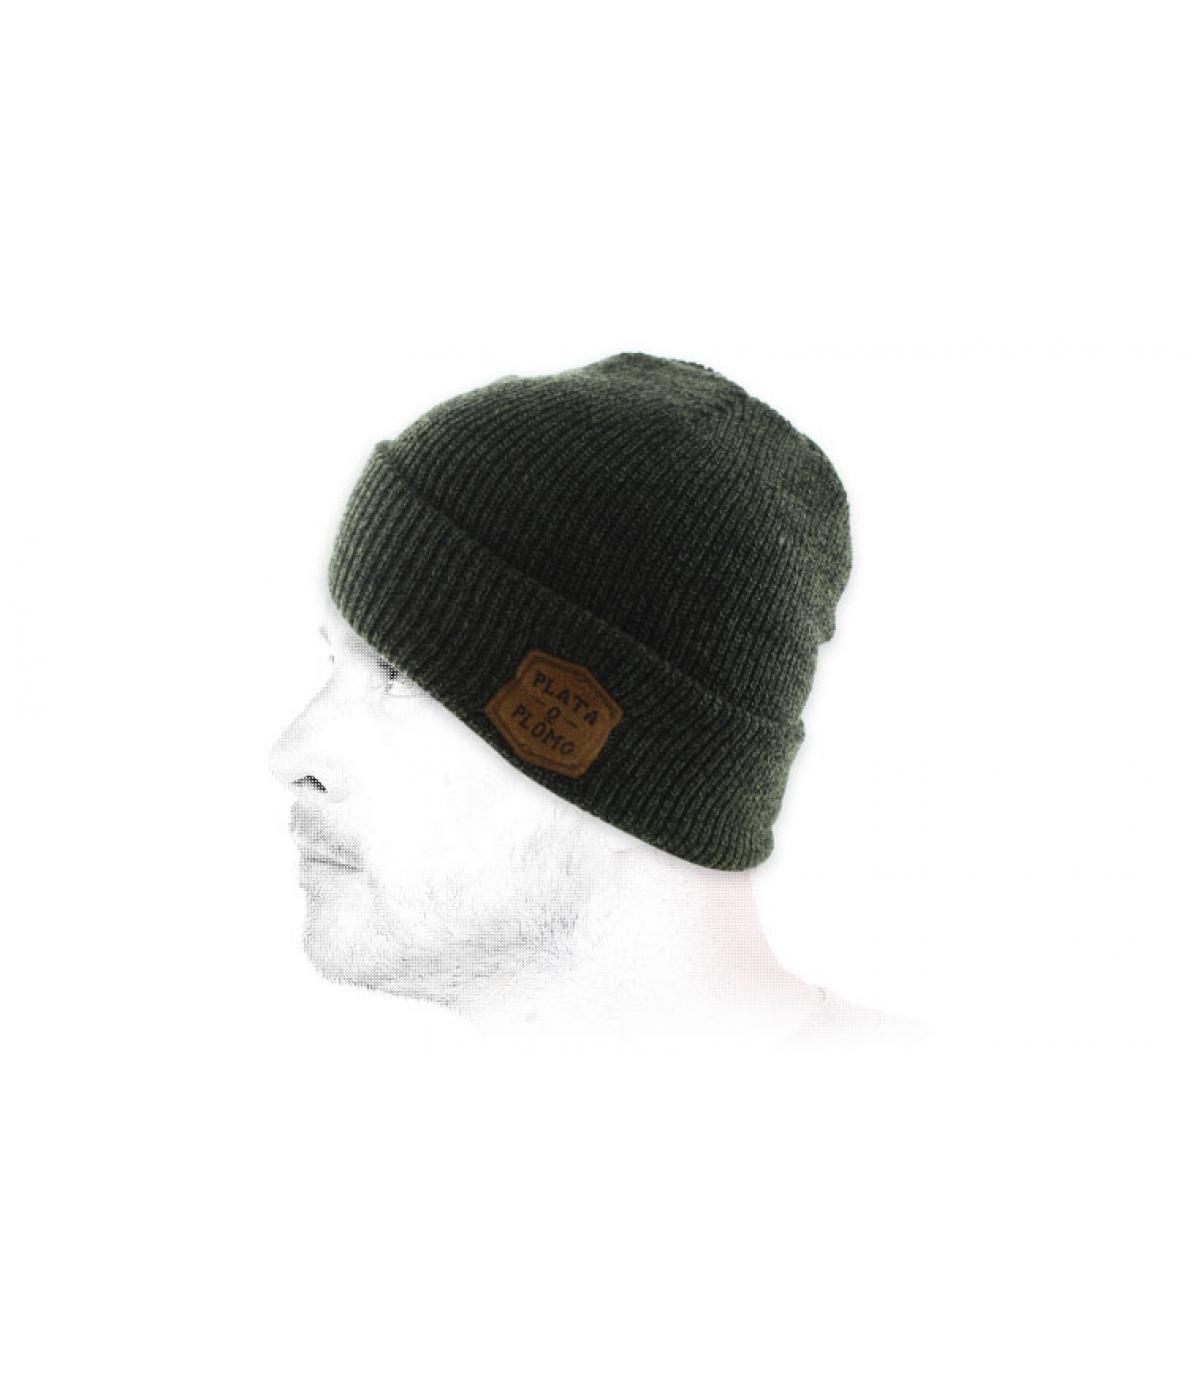 bonnet plata o plomo vert